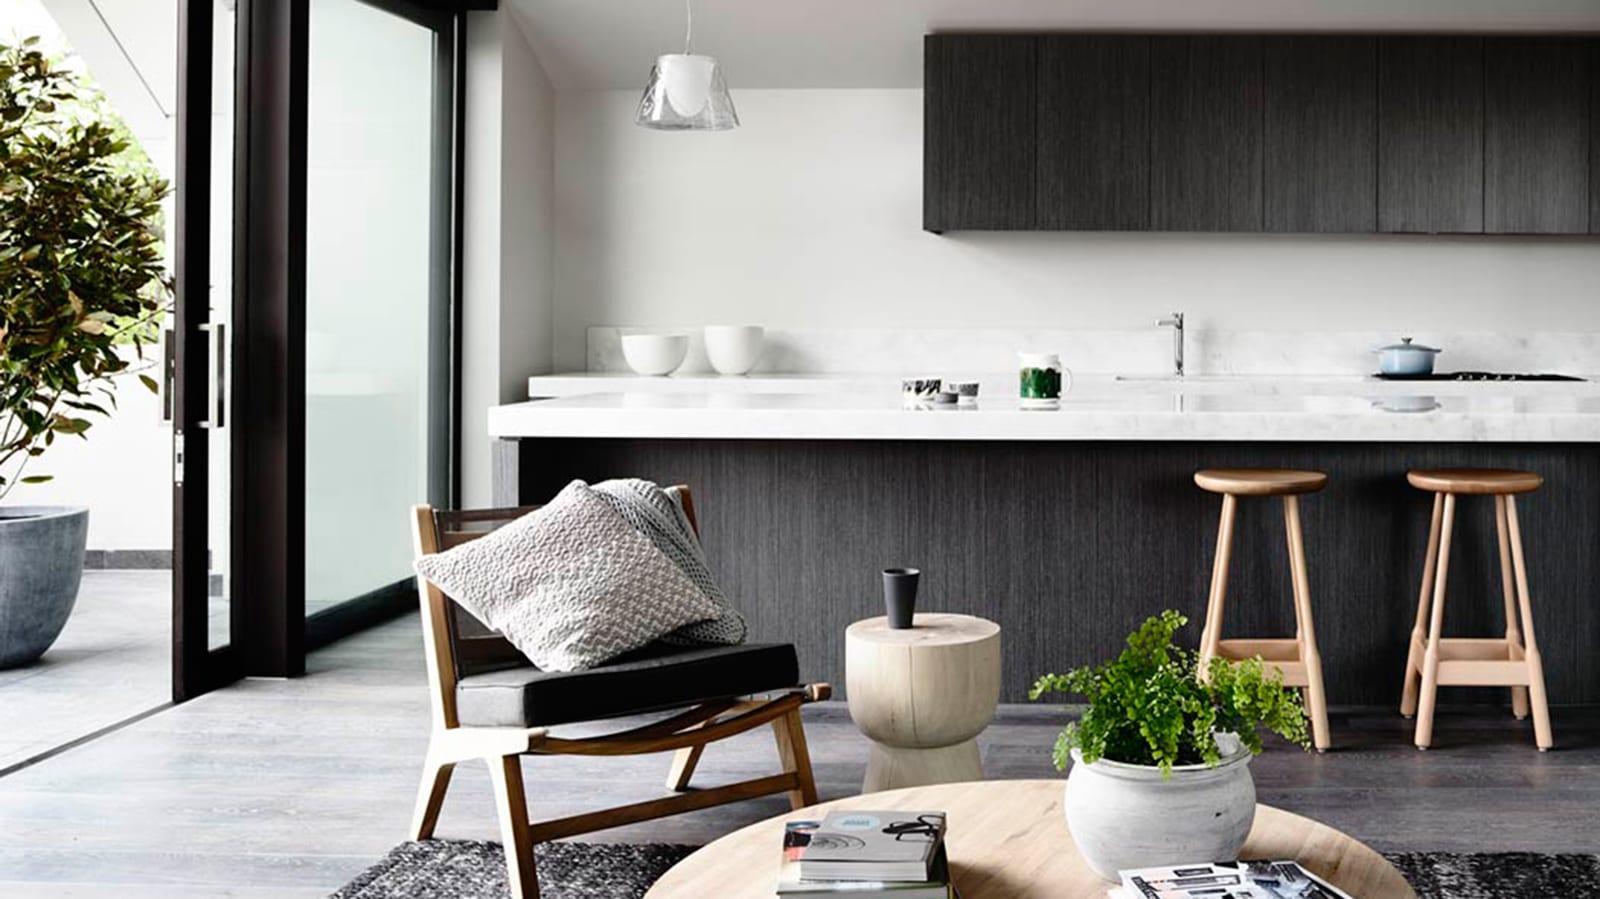 StyleAndMinimalism | Interiors | Bayside Residence by Robert Mills Architects & Interior Designers